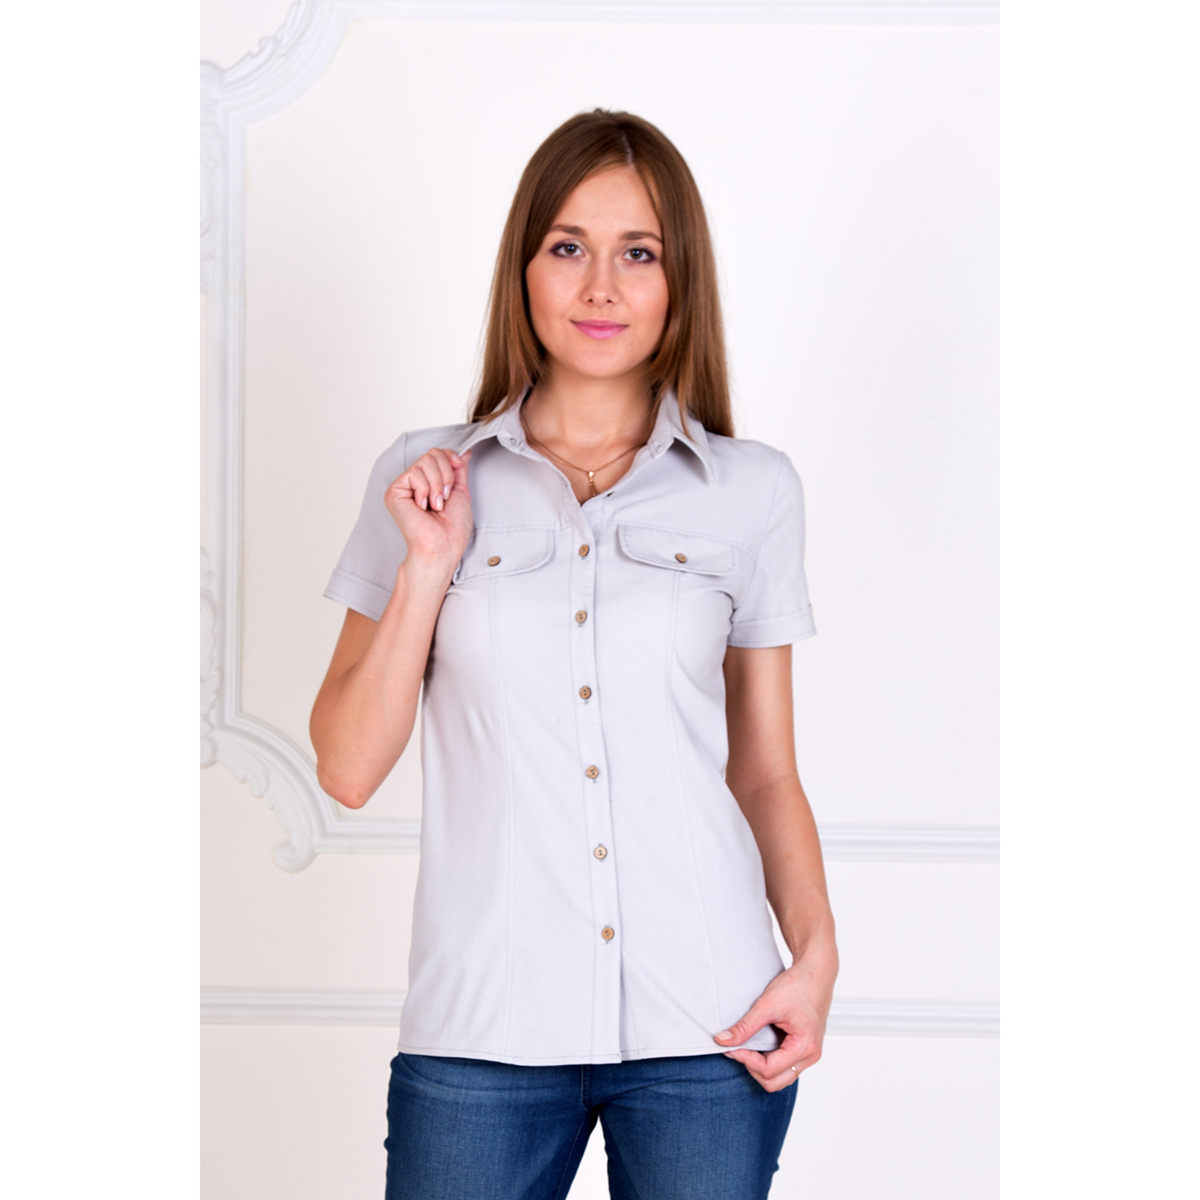 Женская рубашка Александра Серый, размер 42Рубашки<br>Обхват груди: 84 см <br>Обхват талии: 65 см <br>Обхват бедер: 92 см <br>Рост: 167 см<br><br>Тип: Жен. рубашка<br>Размер: 42<br>Материал: Хлопок